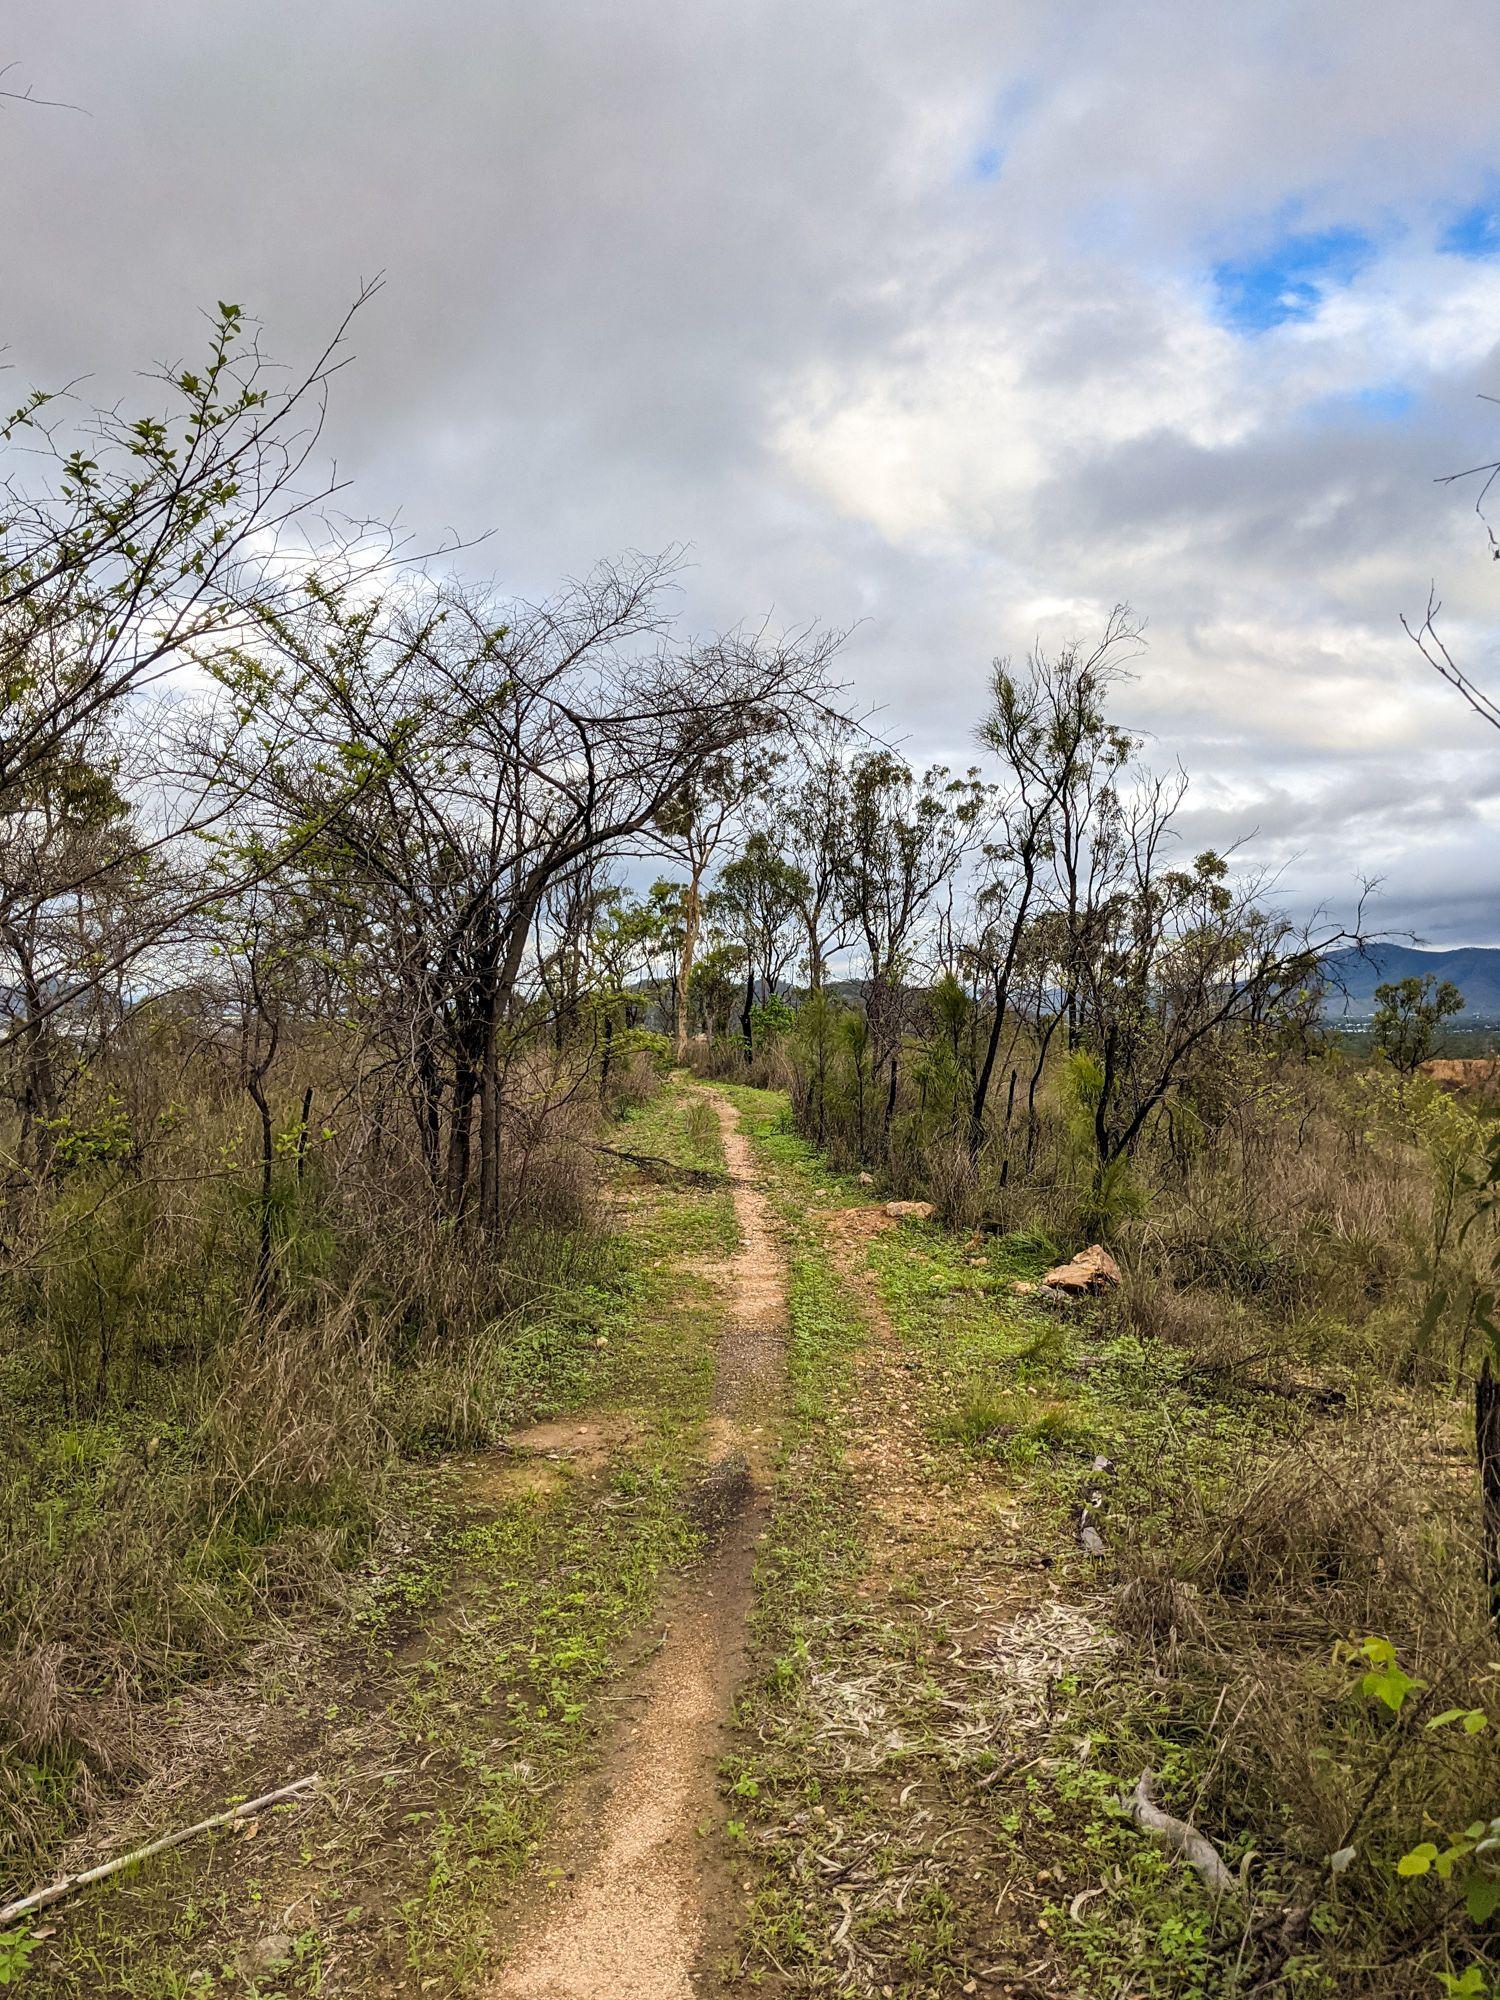 mt bohle trails